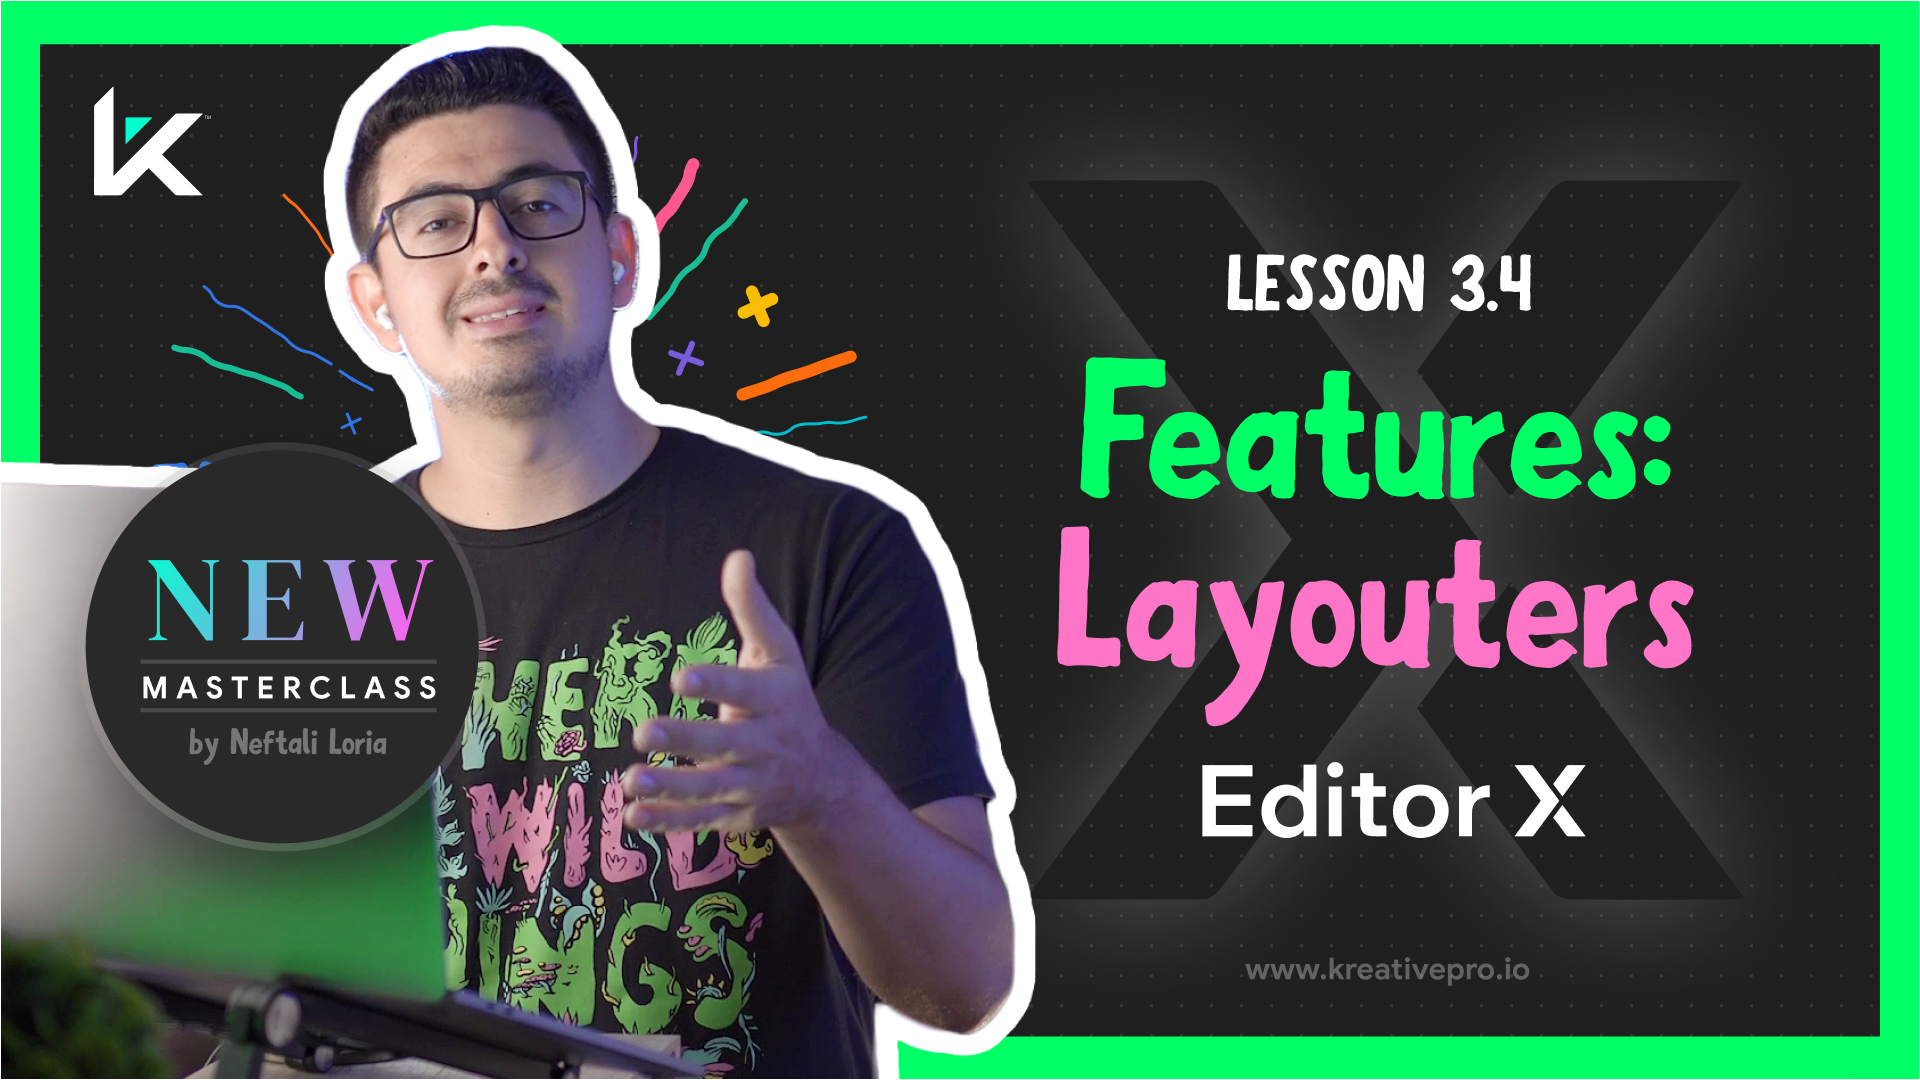 Editor X 3.4 - Editor X Layouters